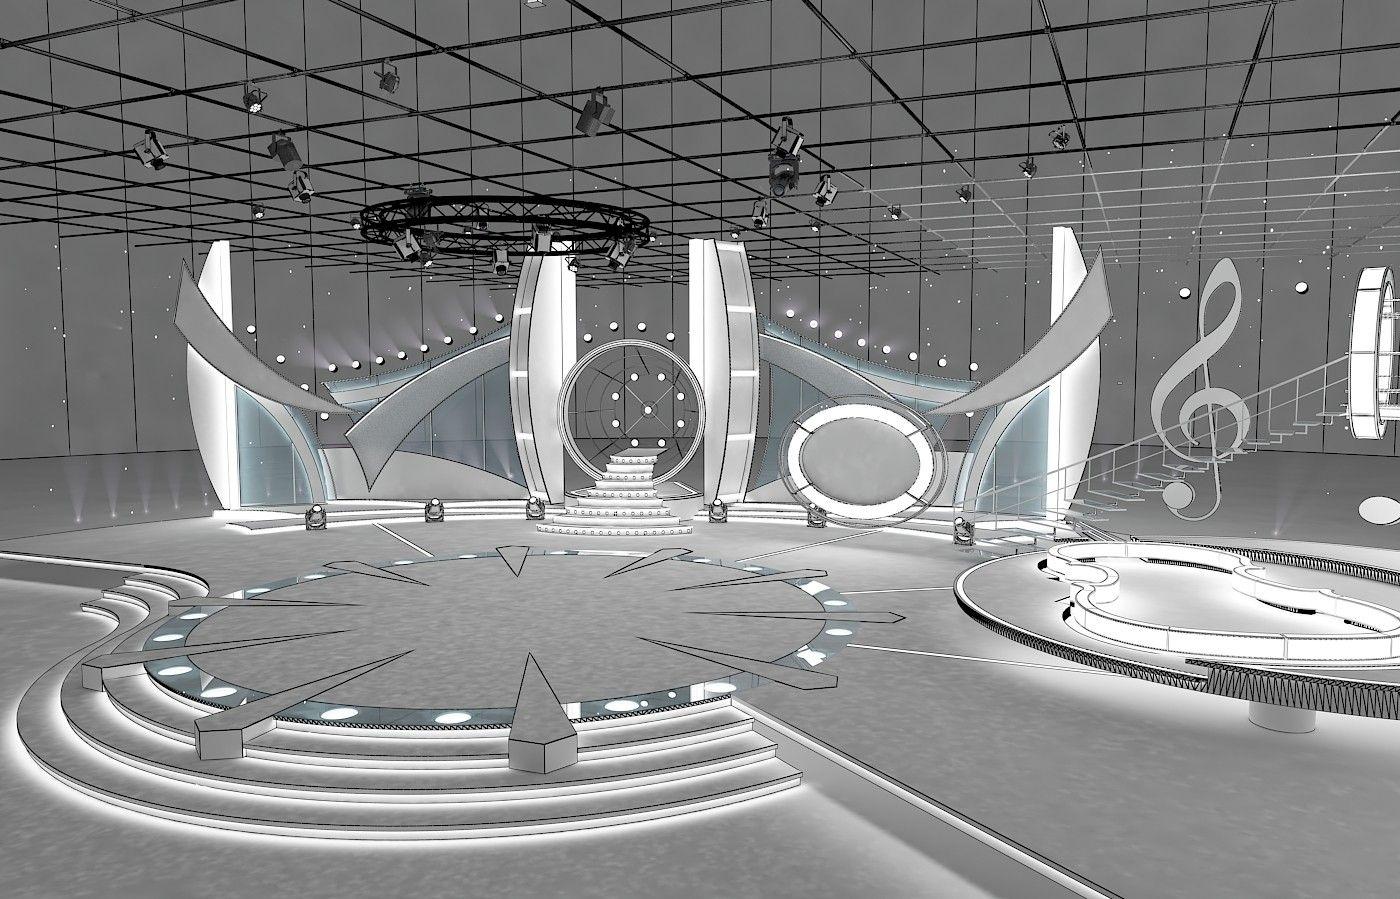 Digital sketching mazzon daniele design studio mazzon daniele design - Explore Stage Design Event Design And More